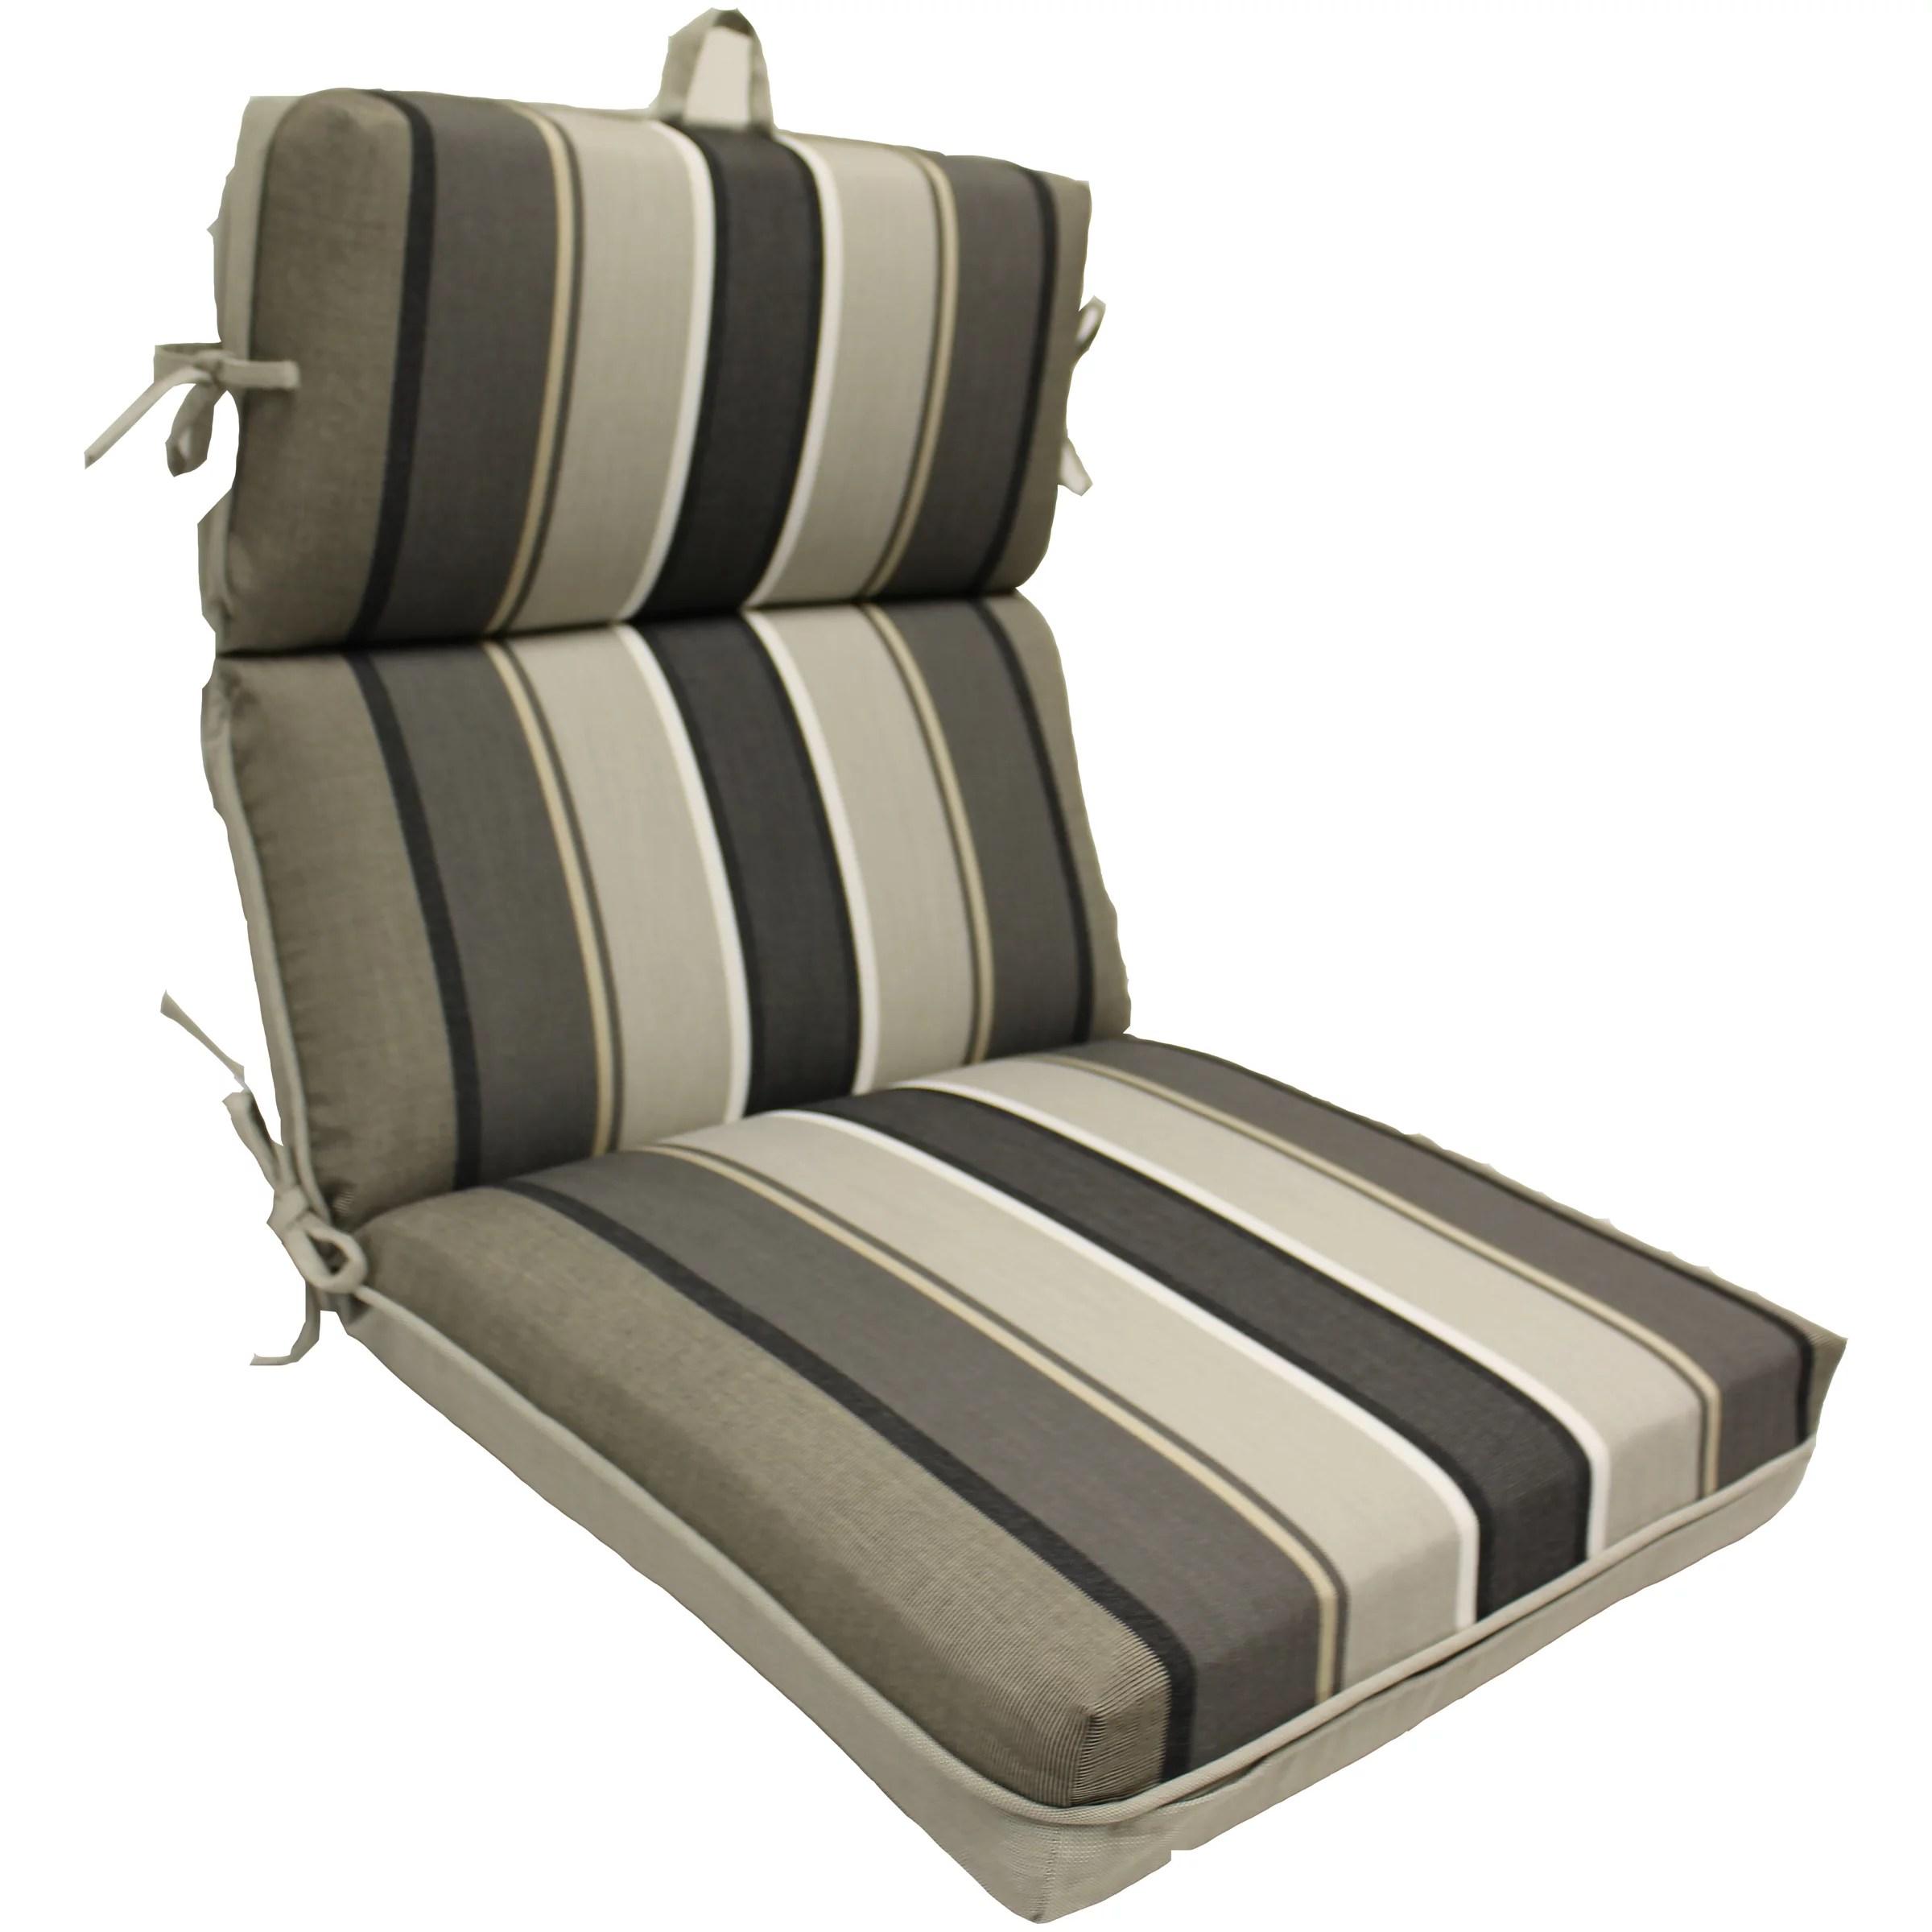 better homes and gardens linen reversible stripe 1 piece dining chair cushion gray 21 x 44 x 4 75 walmart com